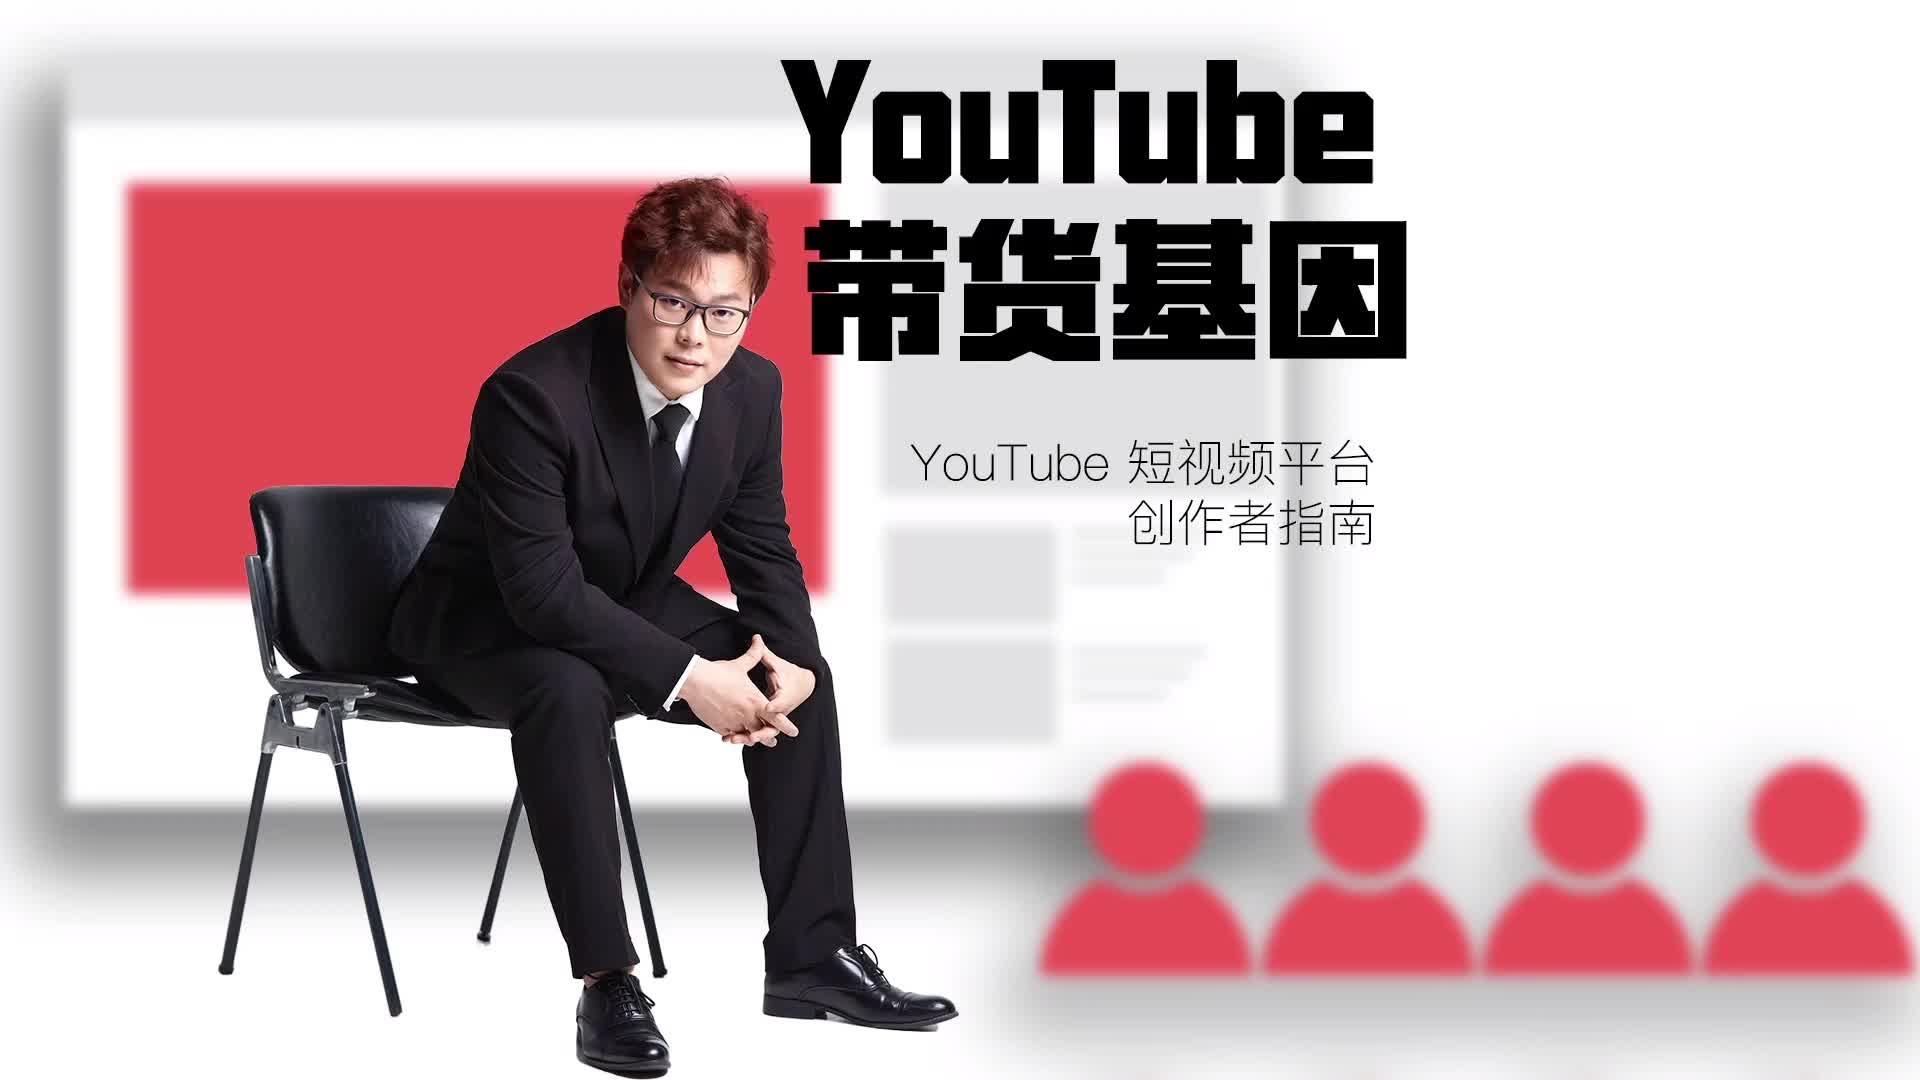 YouTube赚钱 跨境电商建立YouTube频道必修课